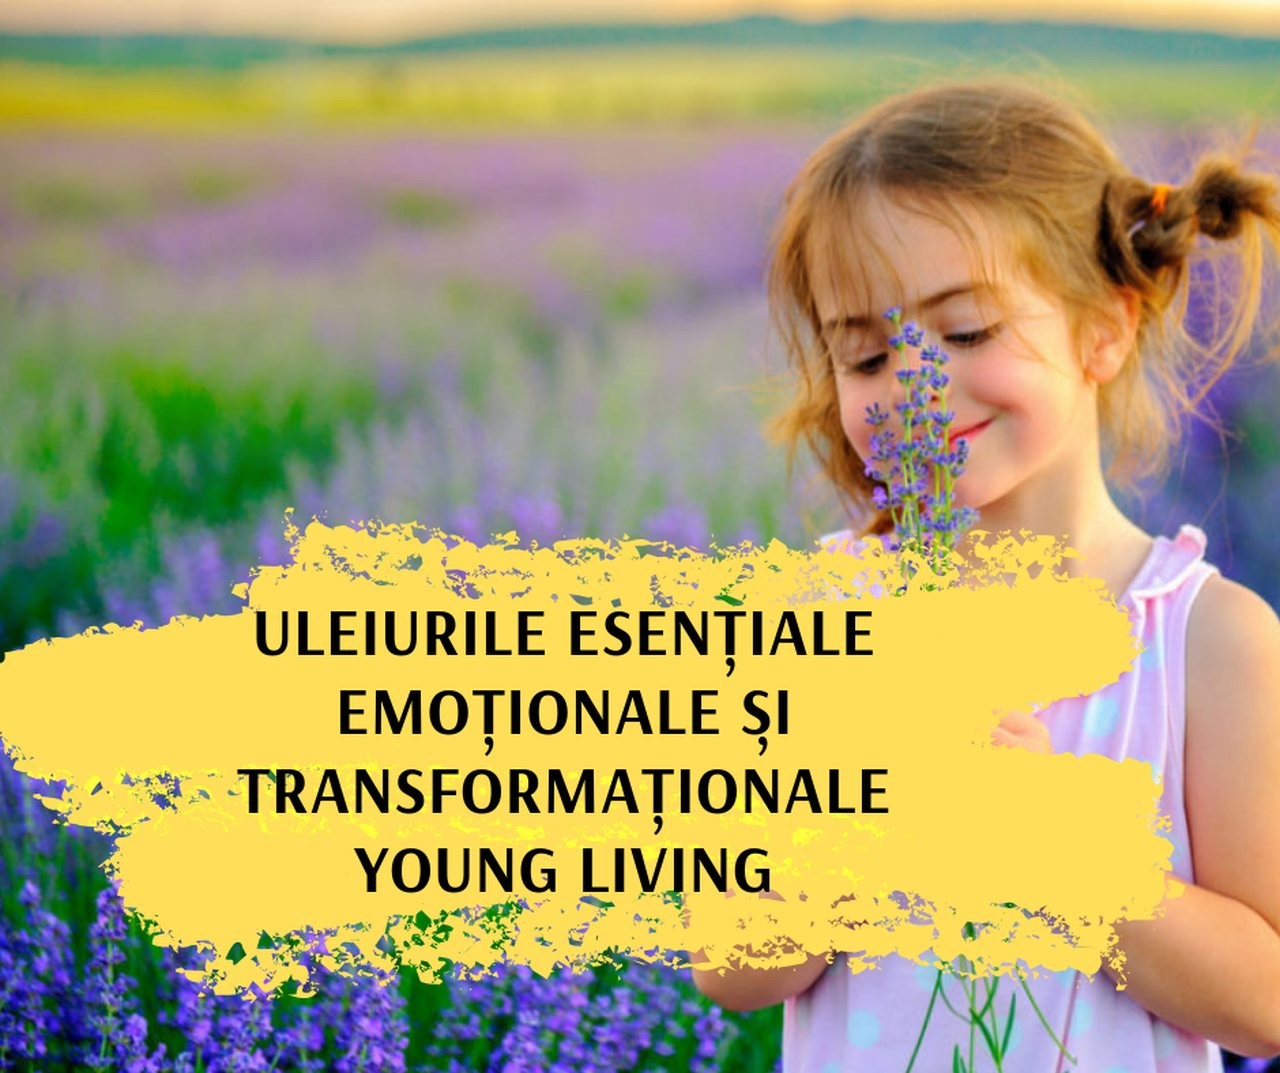 Uleiurile emotionale și transformationale Young Living - titlu_resized